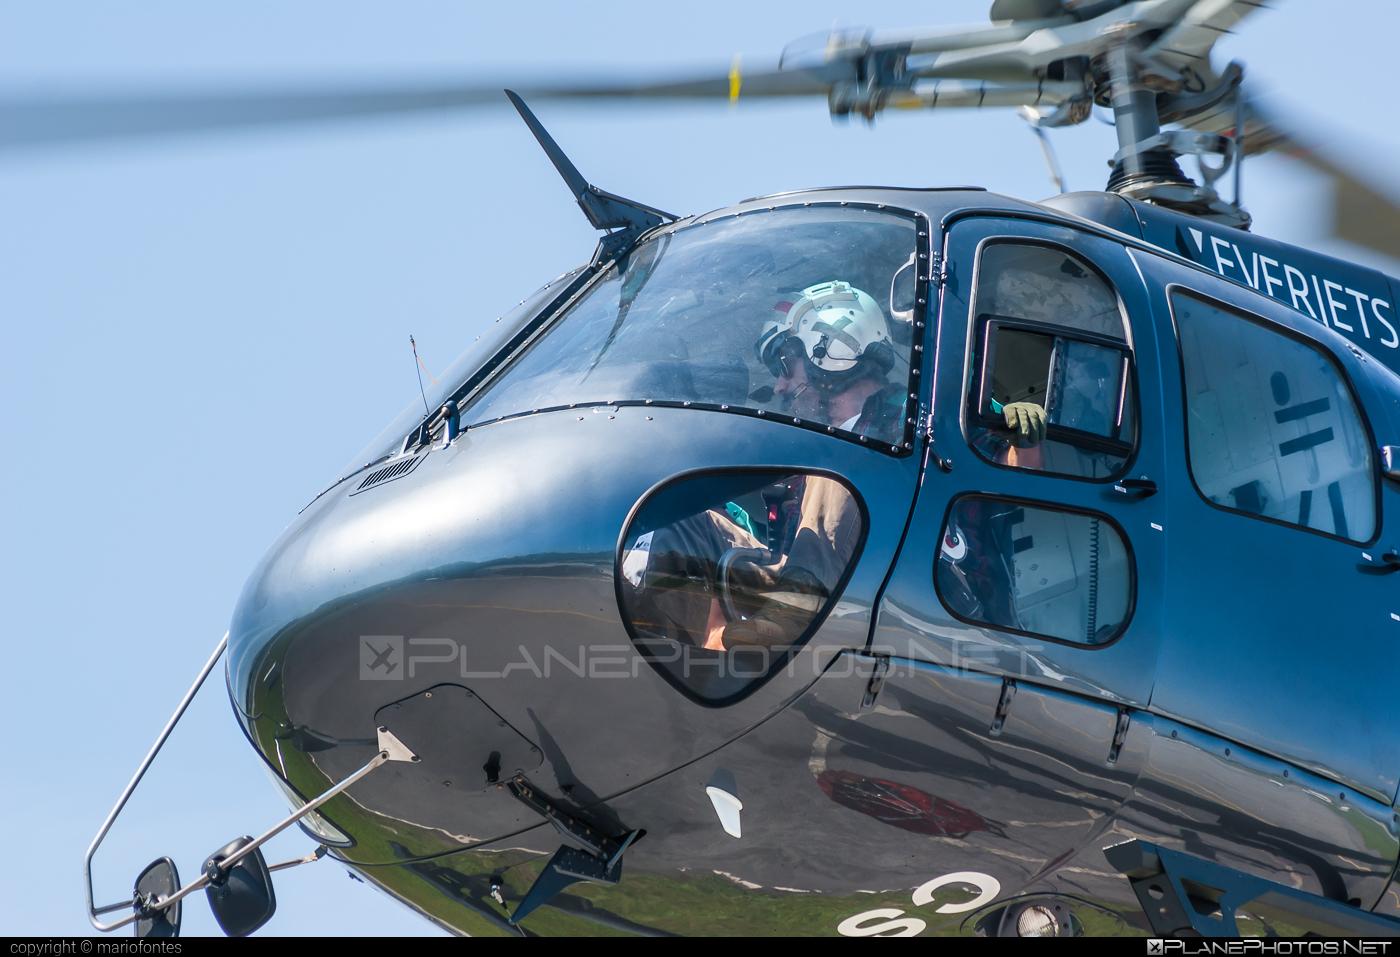 Eurocopter AS350 B3 Ecureuil - CS-HIB operated by Everjets - Aviação Executiva, S.A. #eurocopter #everjets